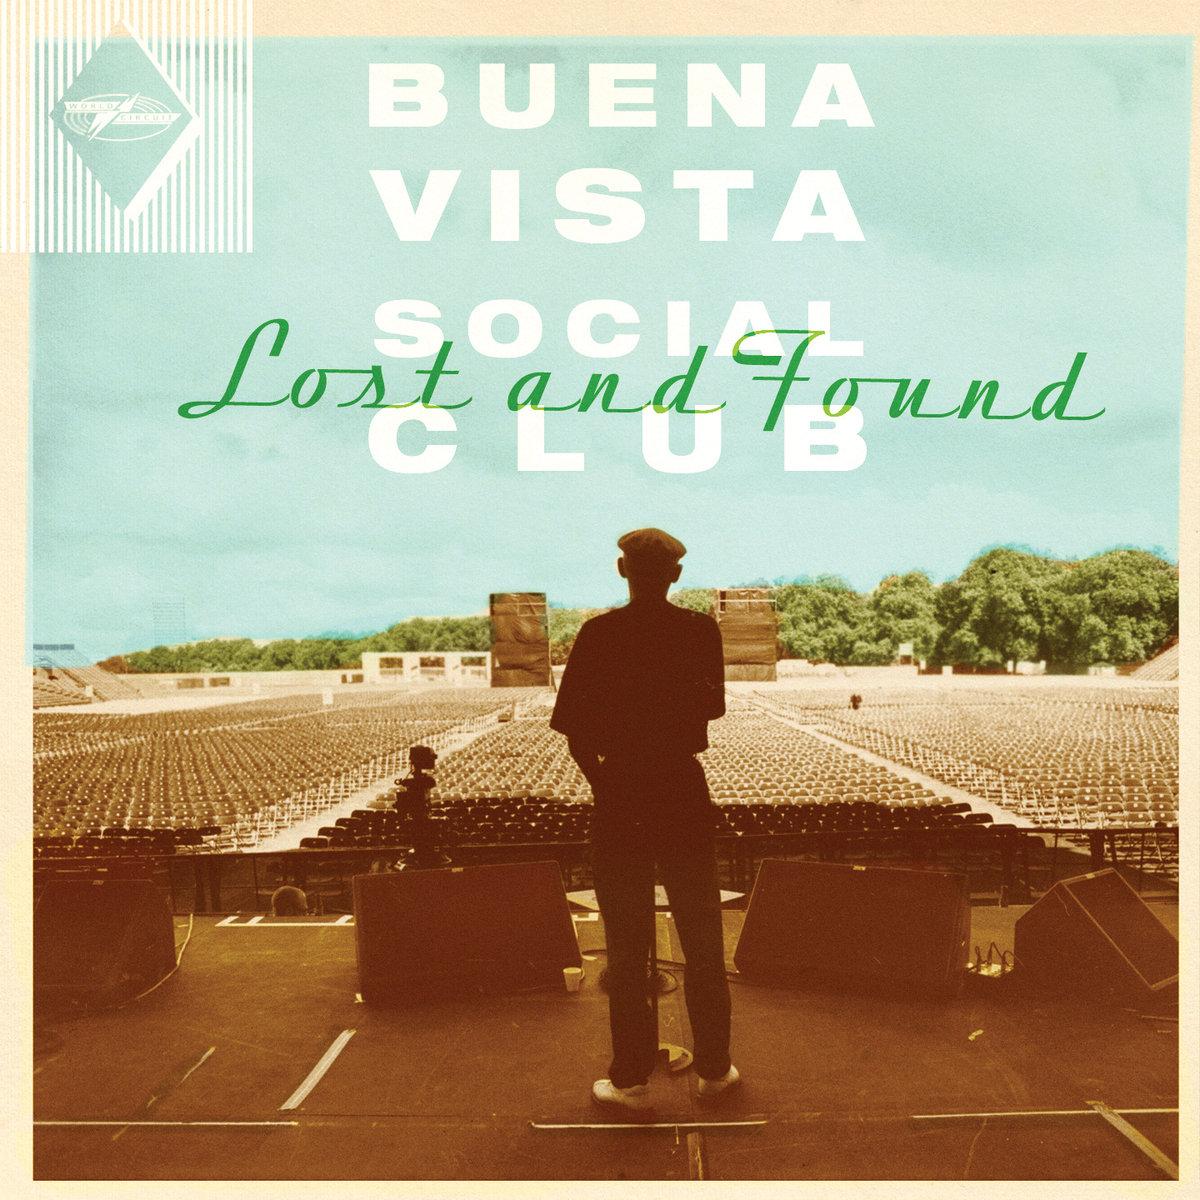 Buena Vista Social Club - Lost & Found (CD) - World Circuit Records